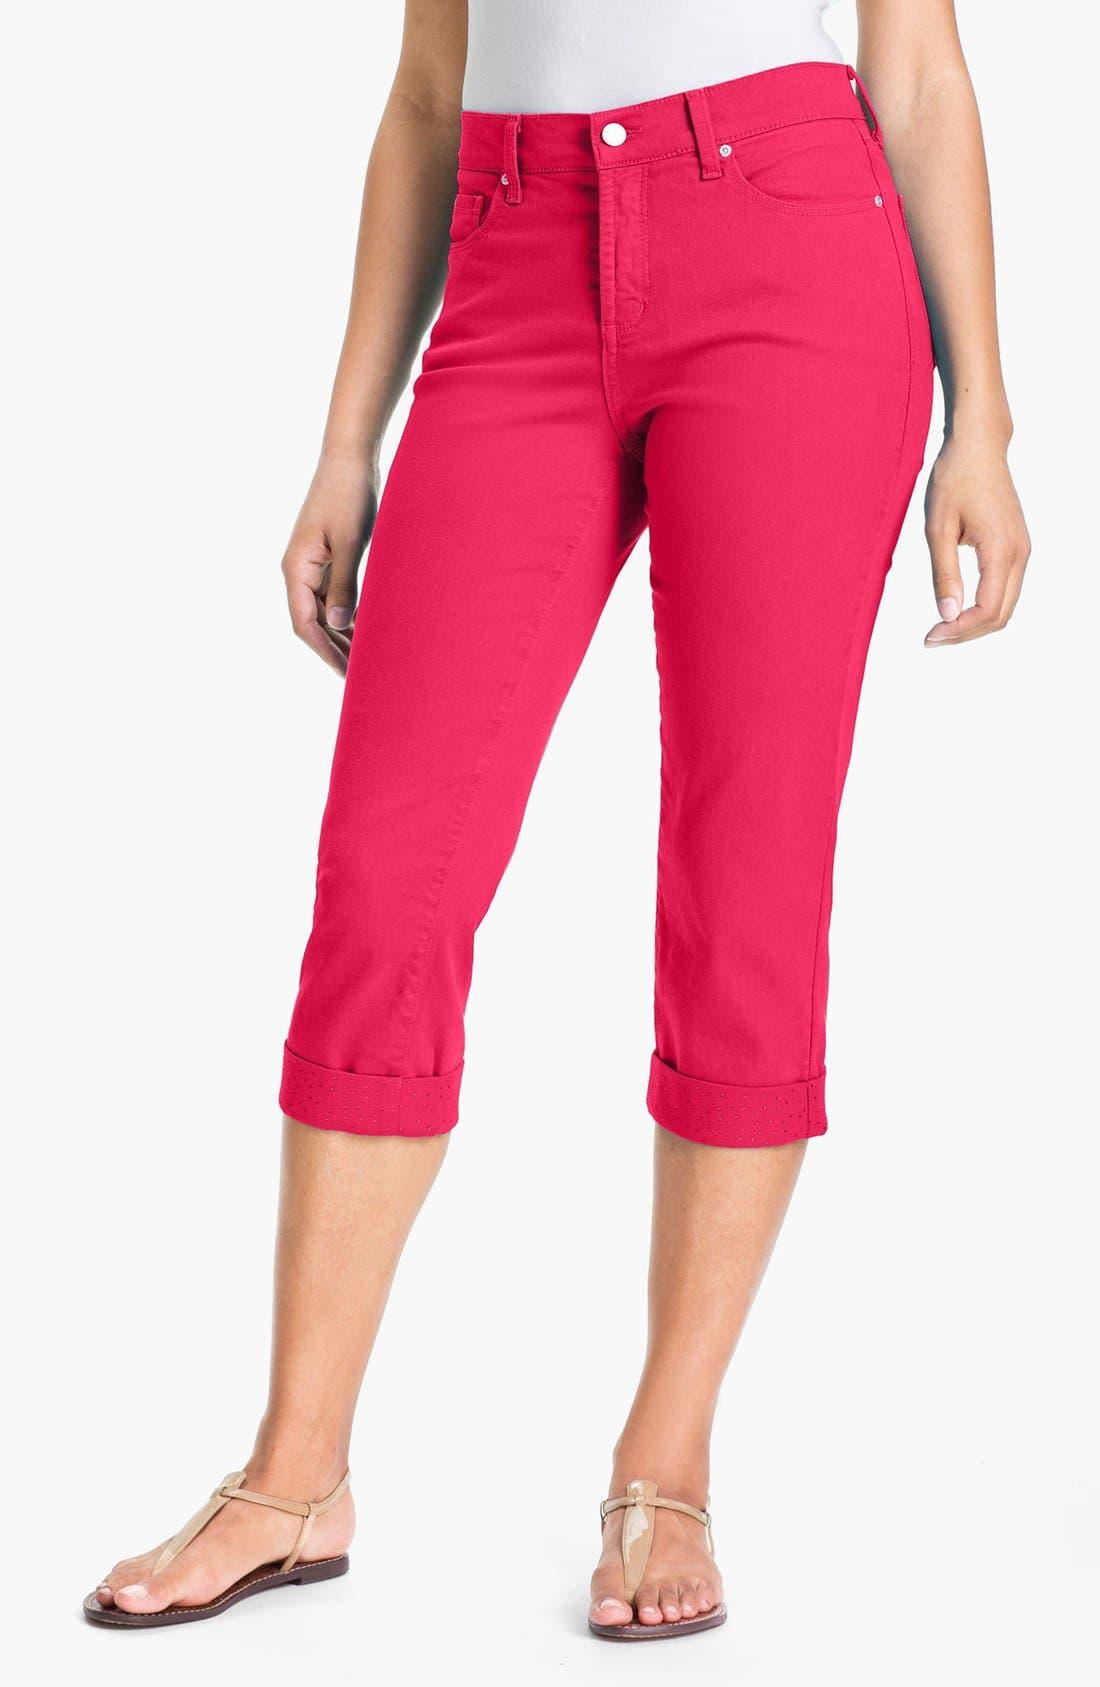 Main Image - NYDJ 'Alyssia' Embellished Crop Jeans (Petite)